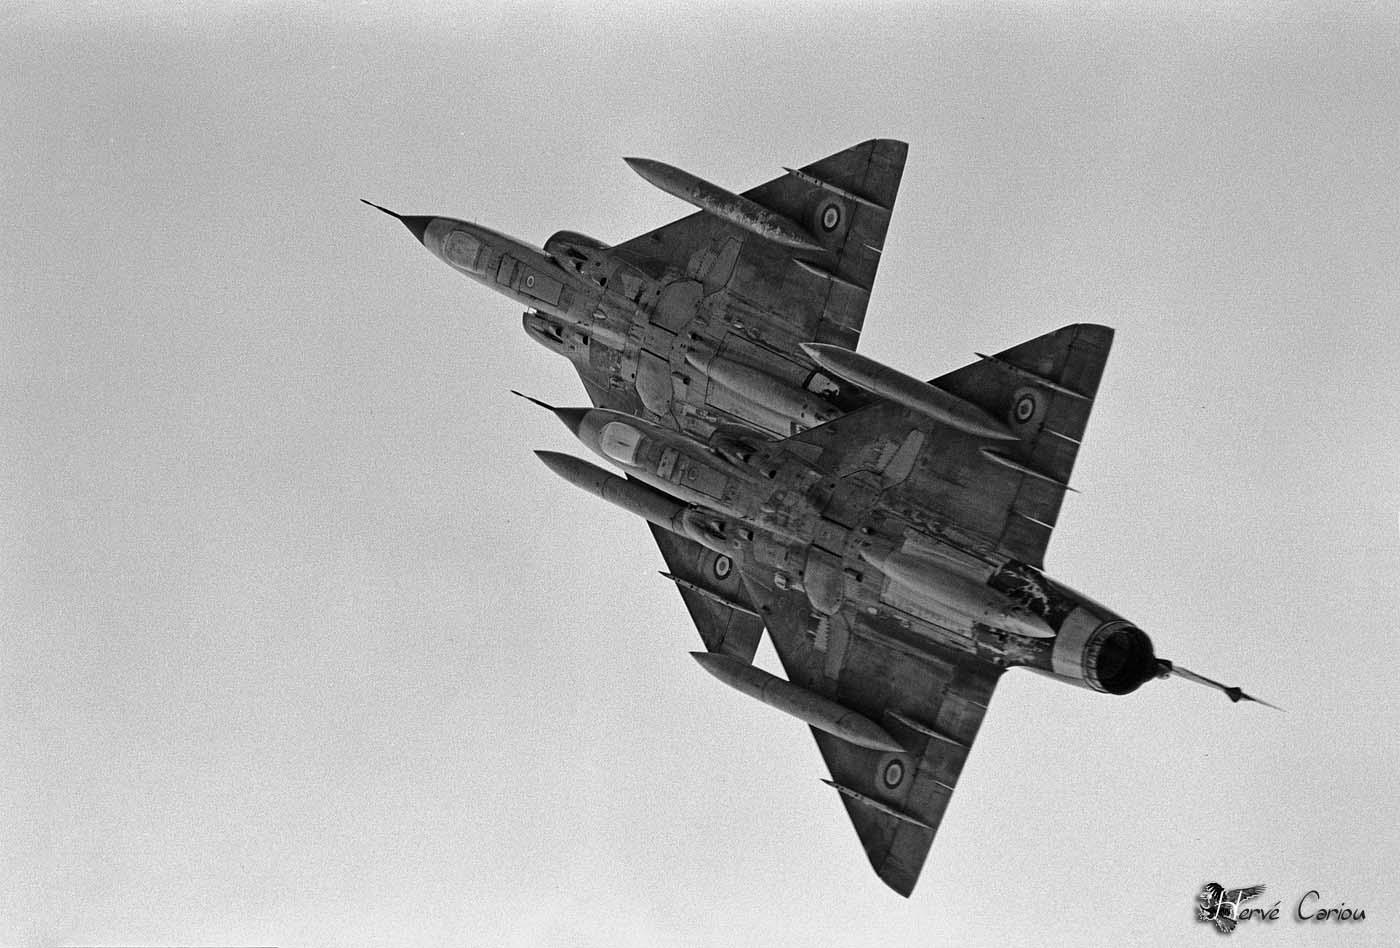 armée de l'air EzztcYUWEAImjat?format=jpg&name=large